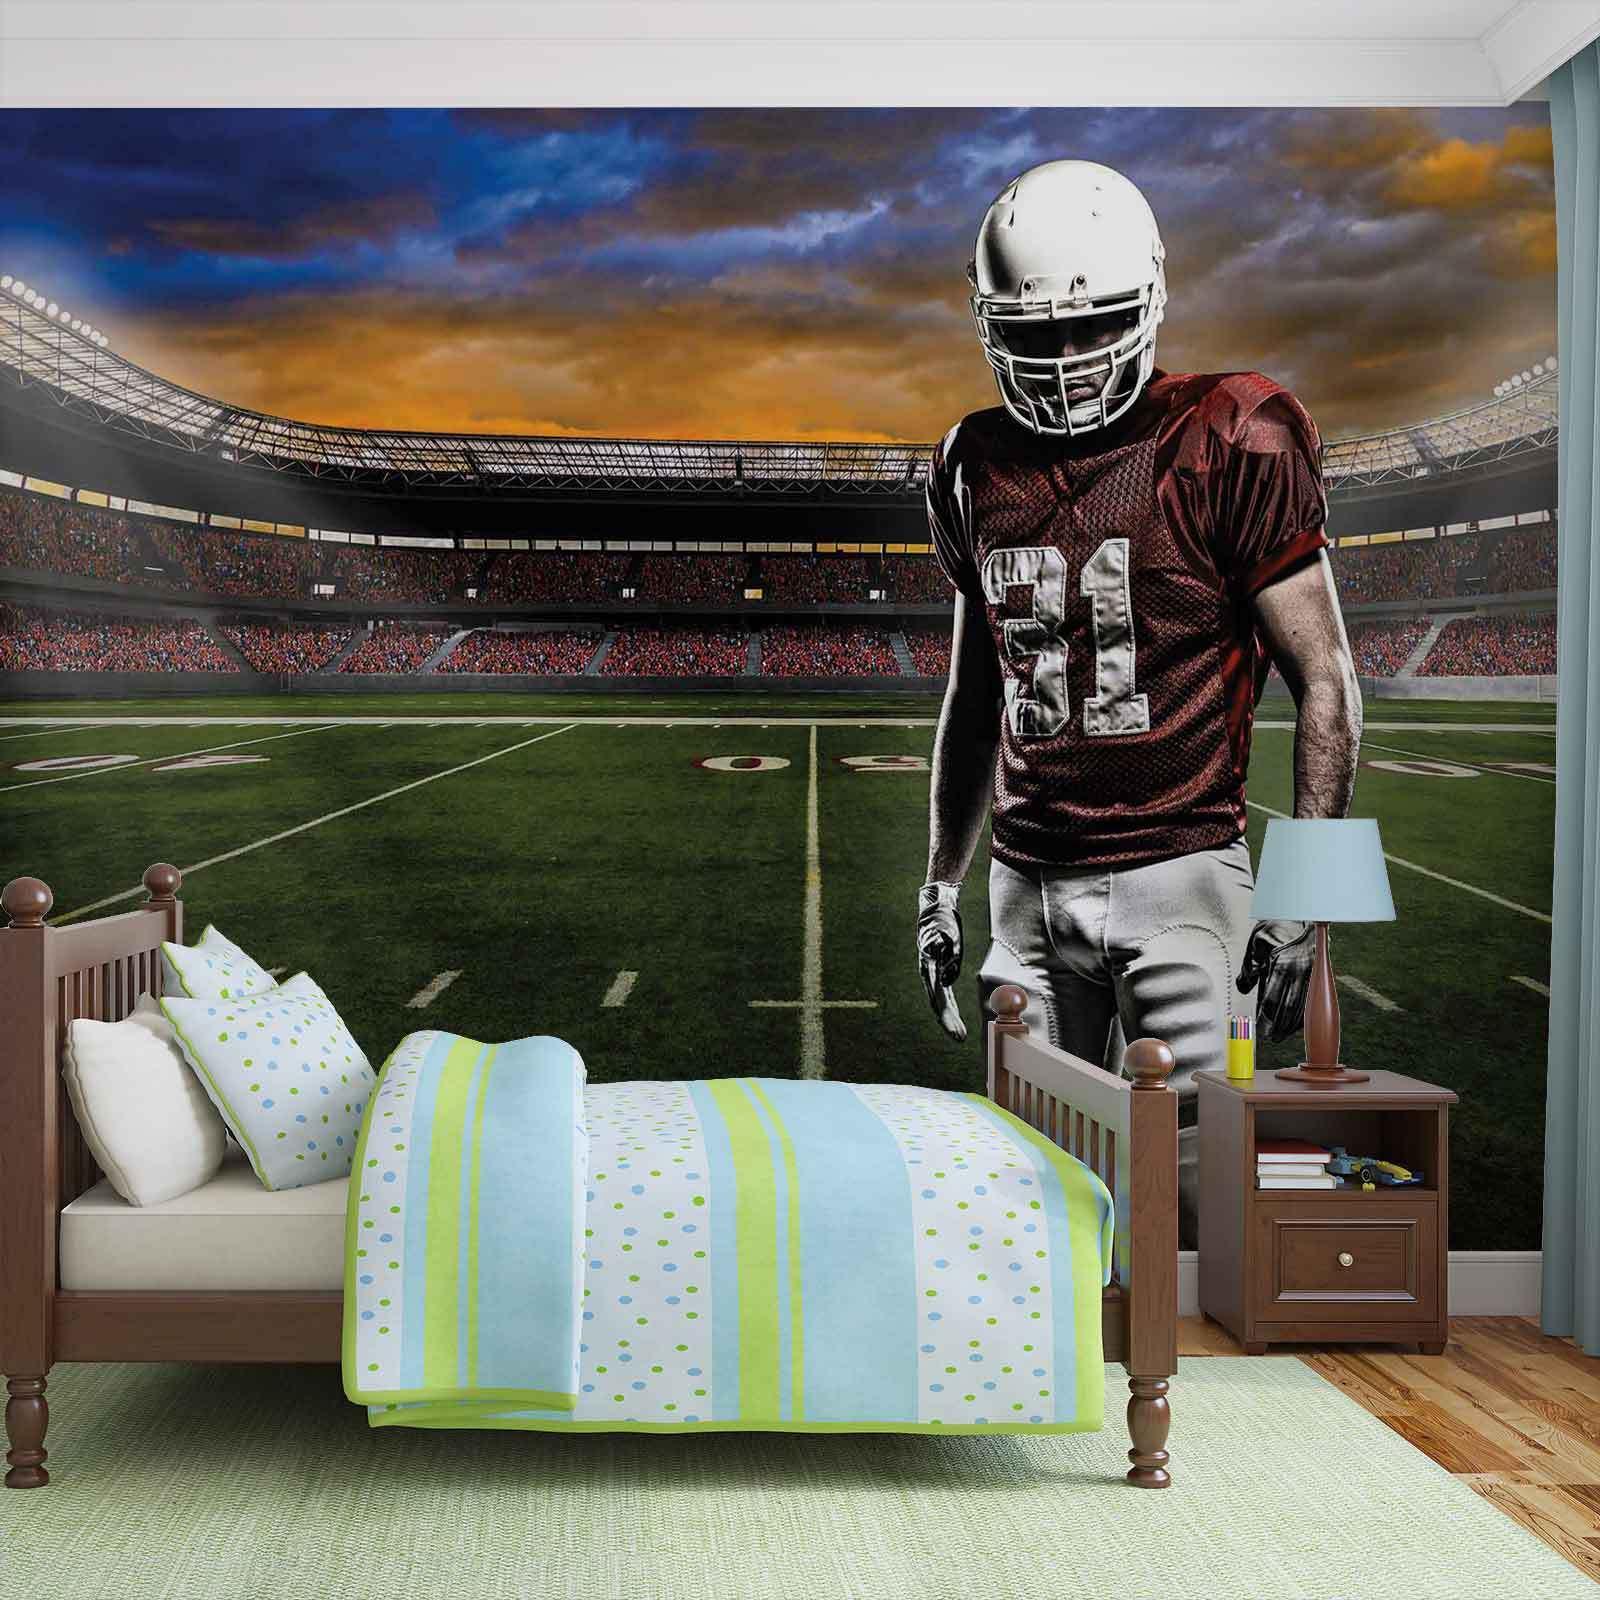 WALL MURAL PHOTO WALLPAPER XXL American Football Stadium (1109WS)